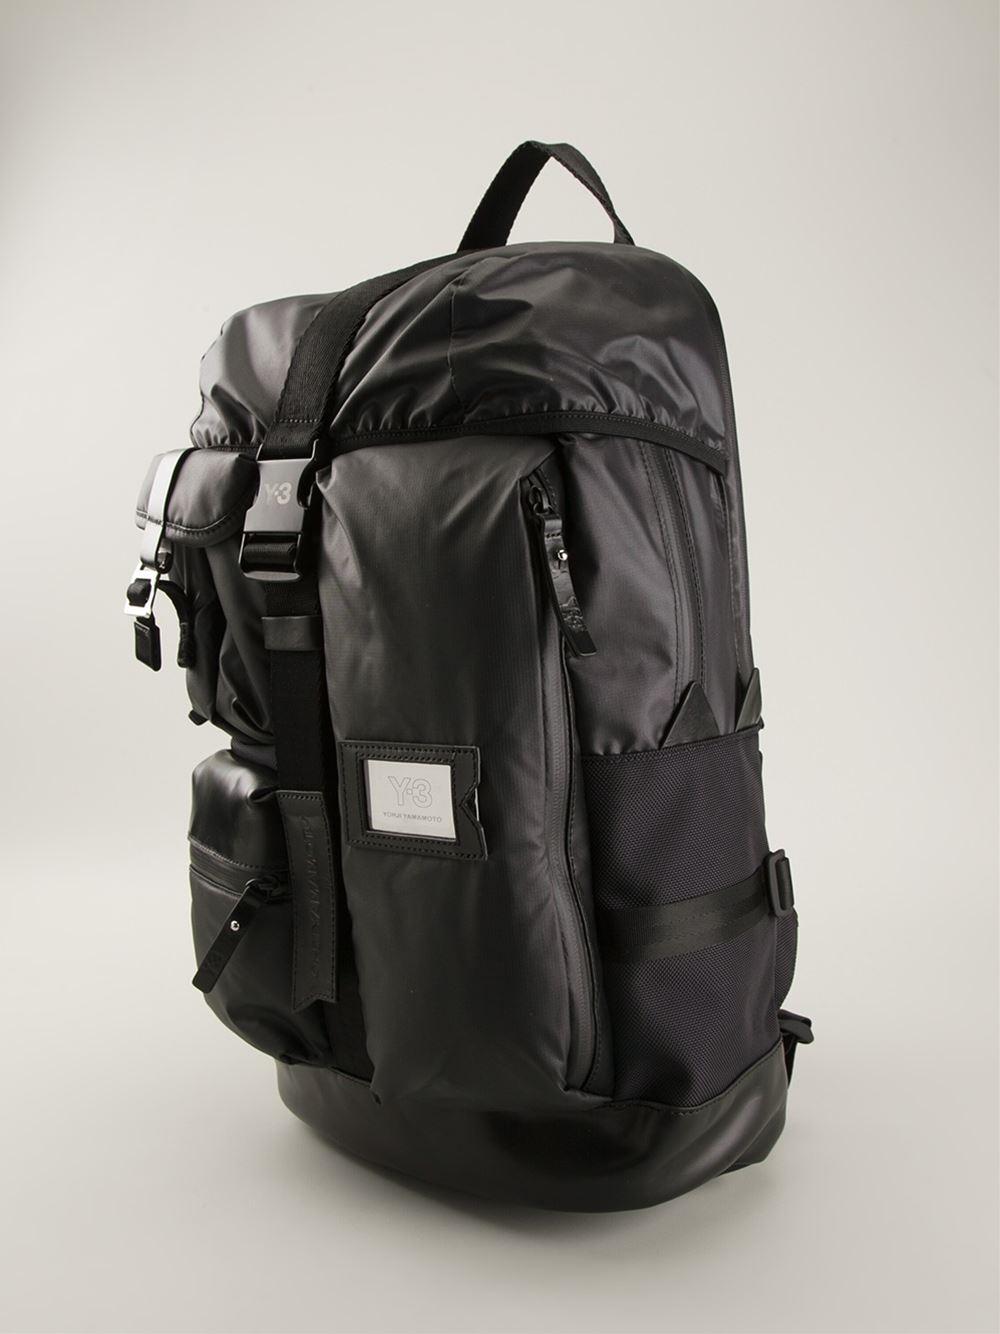 Y-3  mobility  Backpack in Black for Men - Lyst 145ff80393c6f